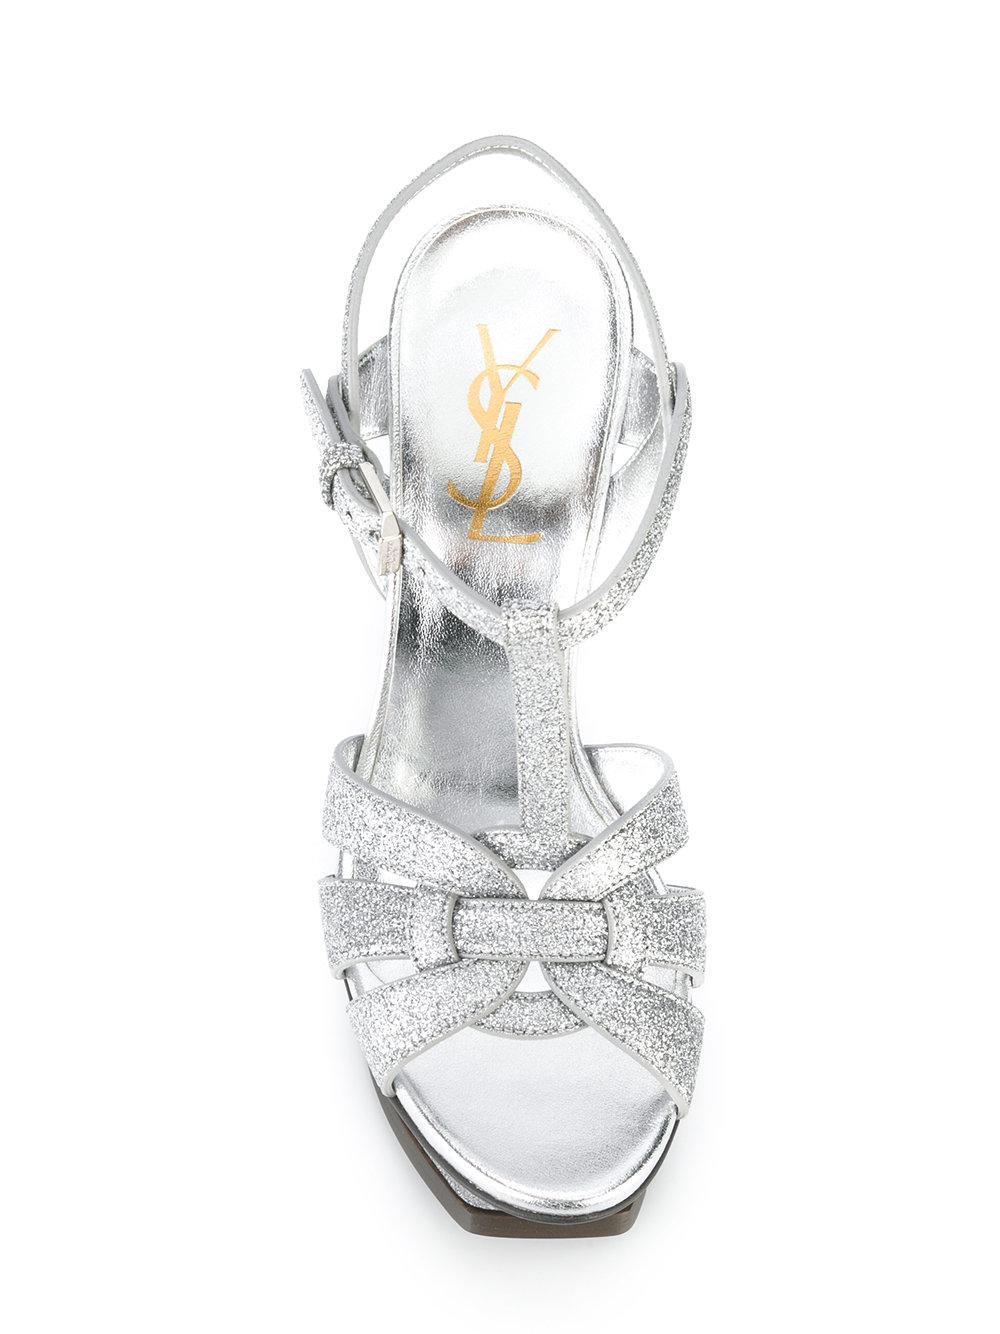 000a88d2403 Lyst - Saint Laurent  classic Tribute 105  Sandals in Metallic